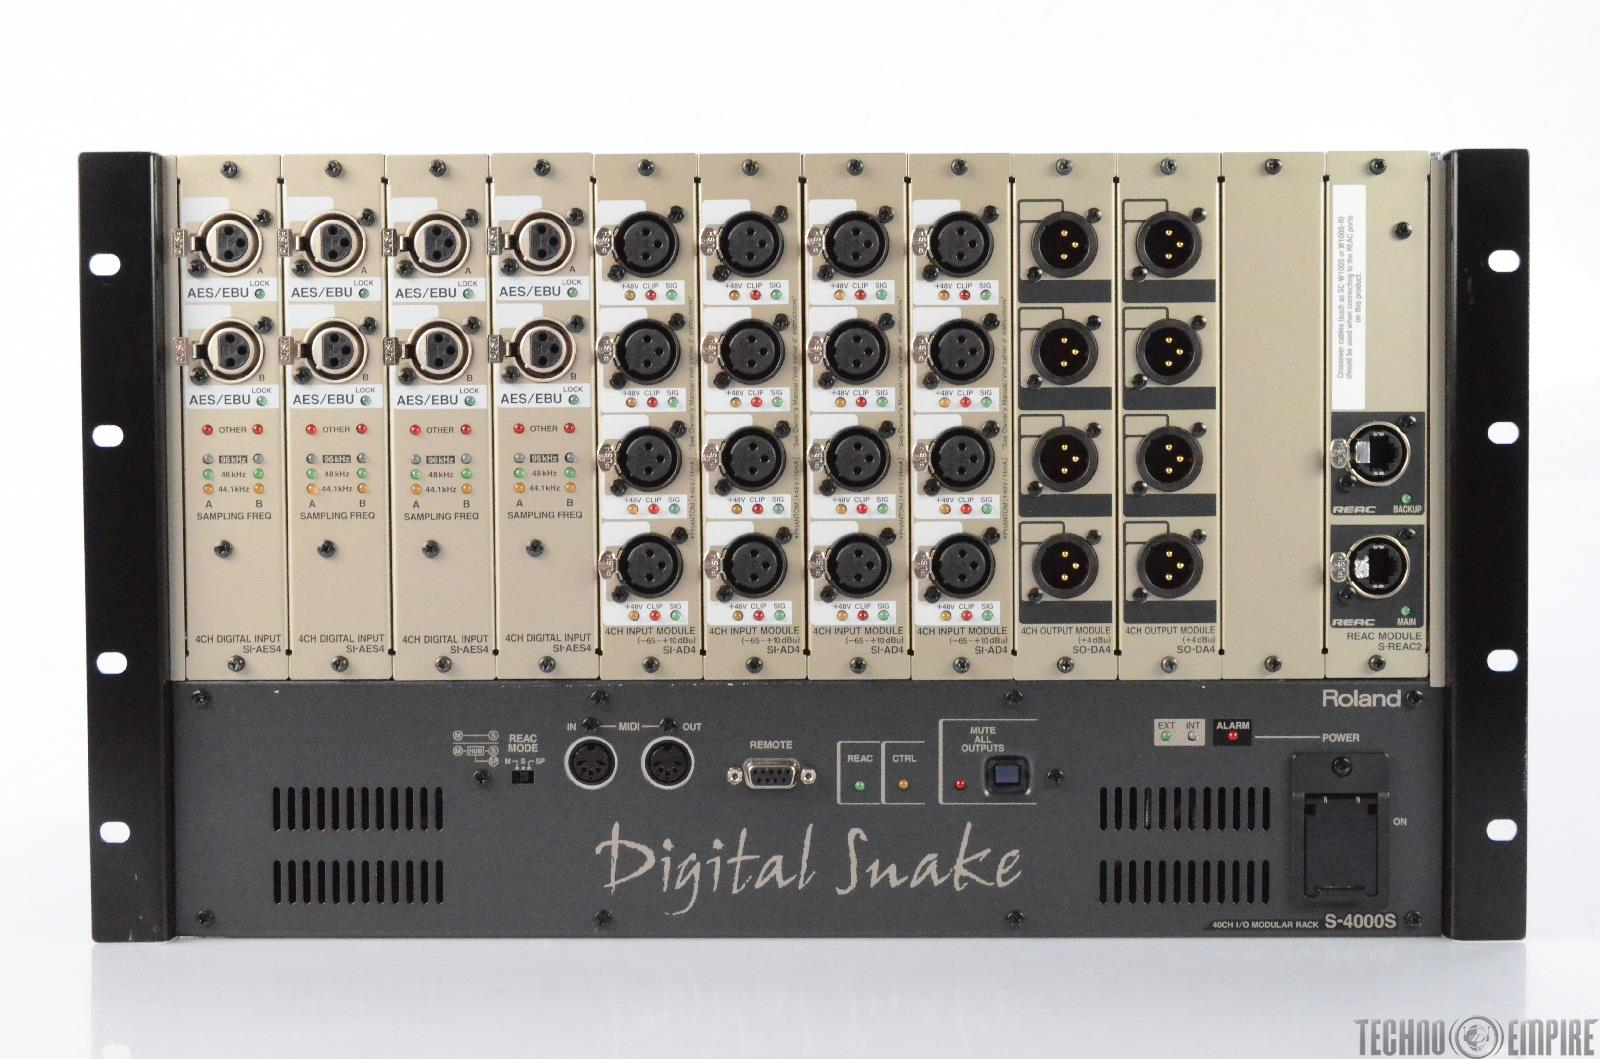 Roland S-4000S Digital Snake 40 Channel I/O Modular Rack #28922